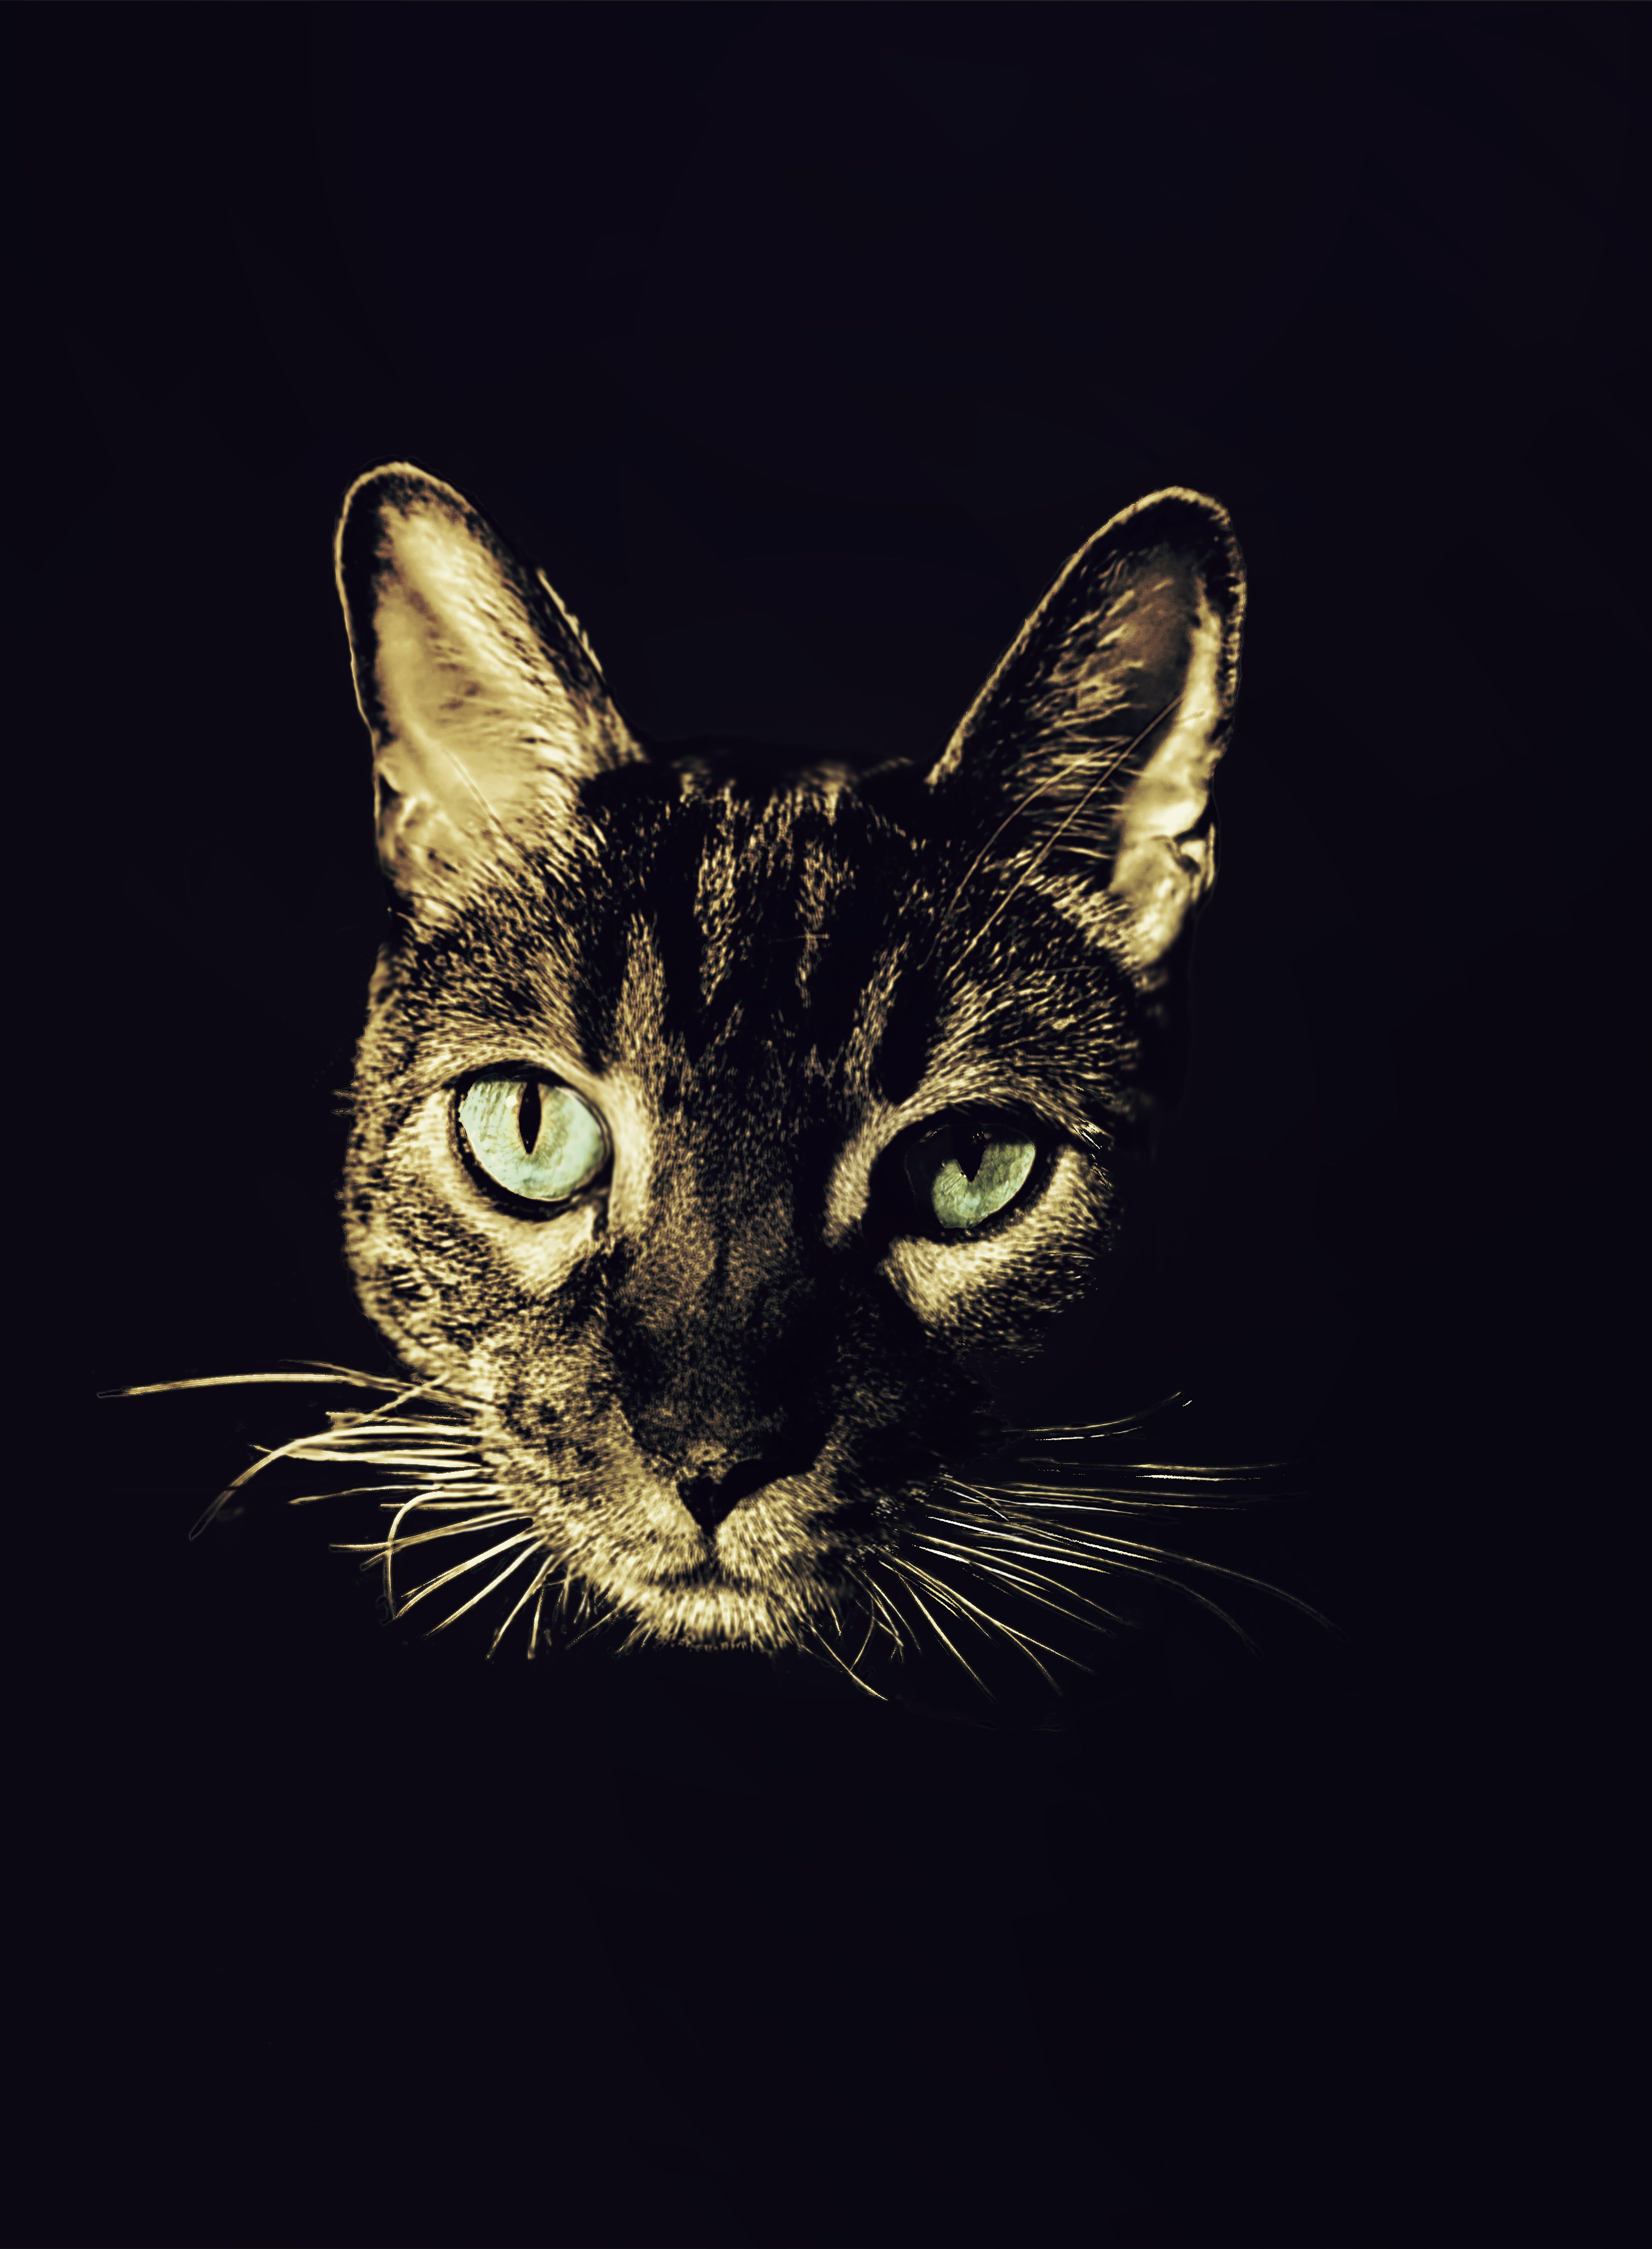 Free stock photo of Bengal cat, cat, male cat